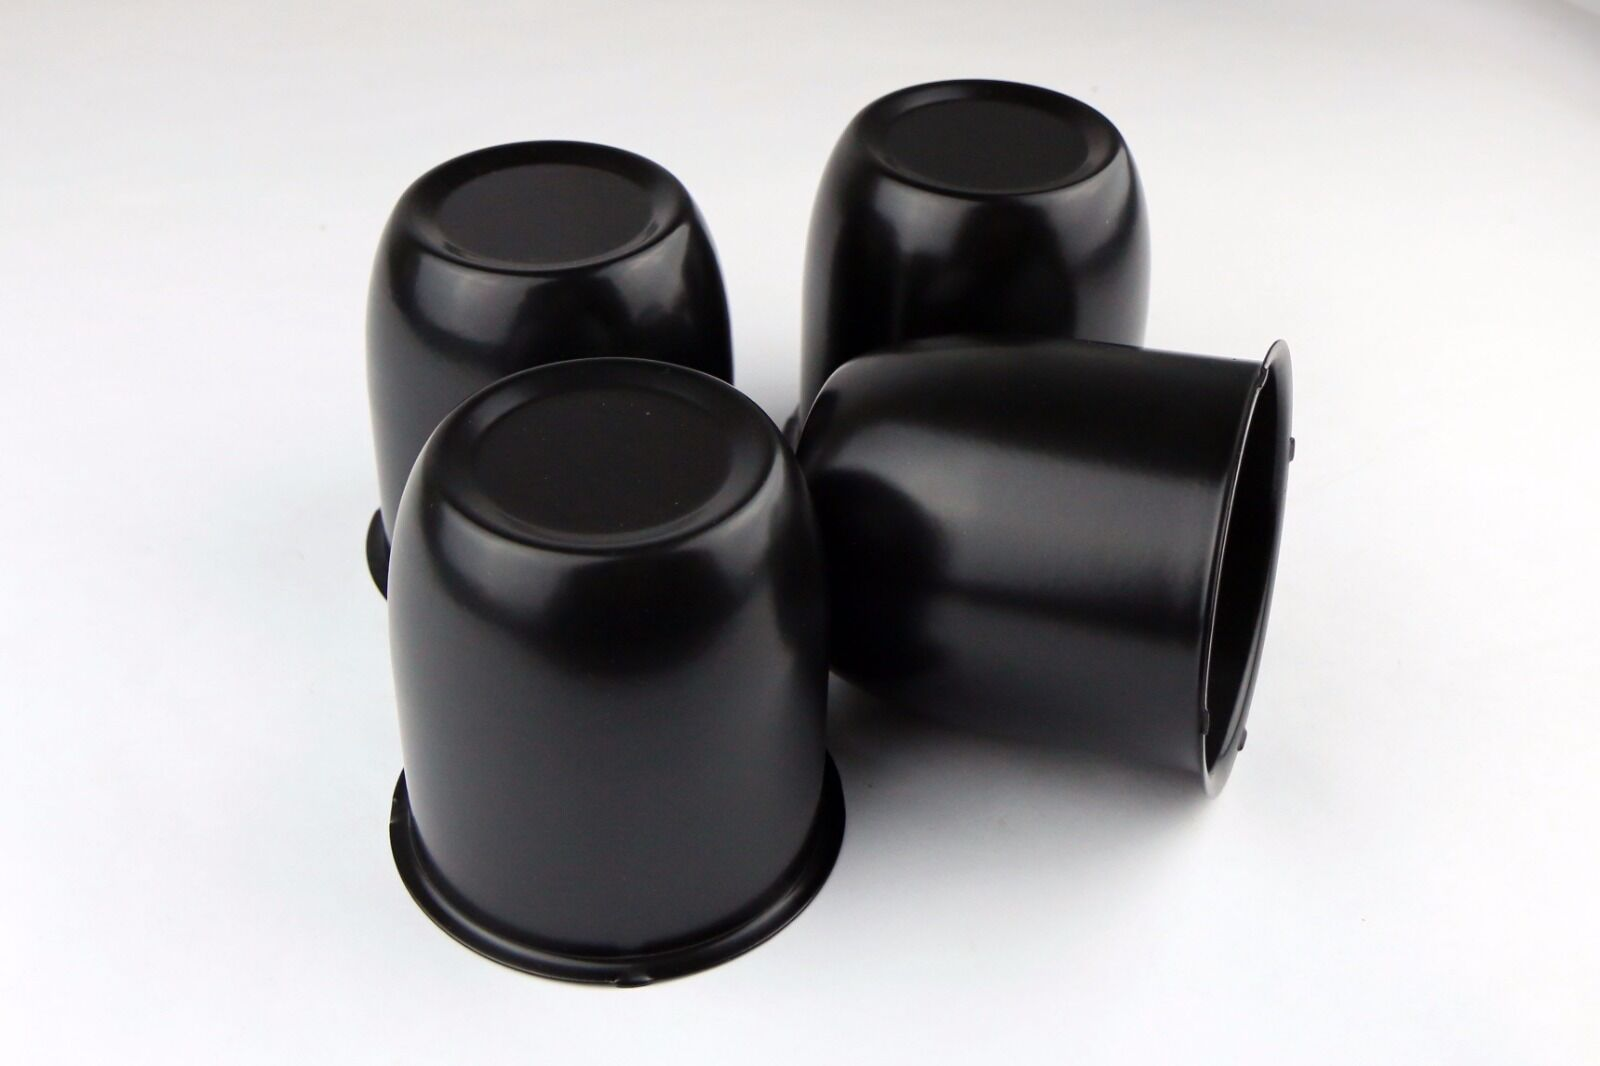 4 x Chrome Steel Push Thru Center Caps Fit Wheels Rims with 3.30 Center Bore!!!